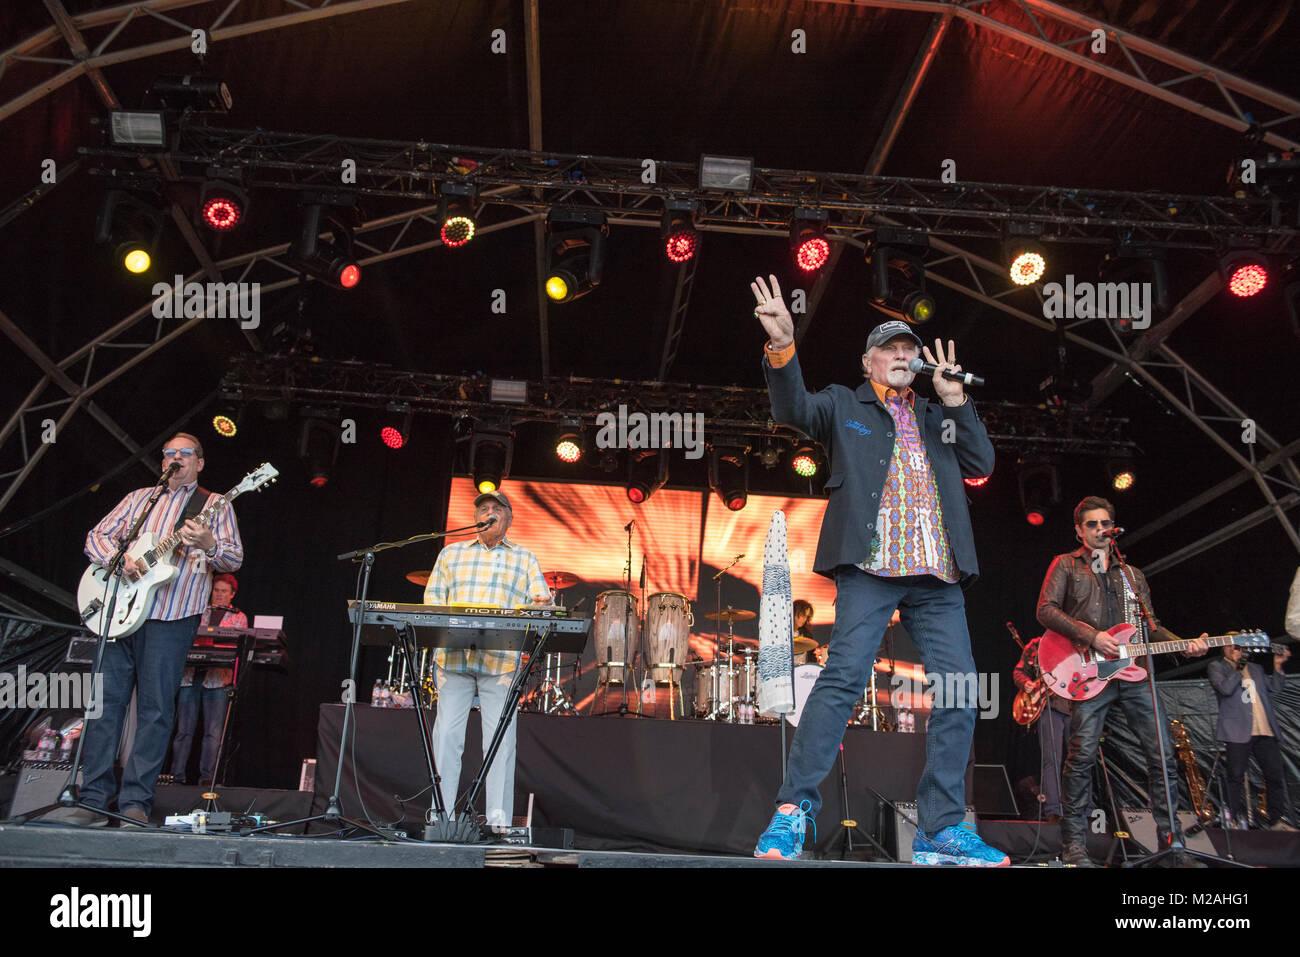 The Beach Boys at Montrose Music Festival 2017. - Stock Image